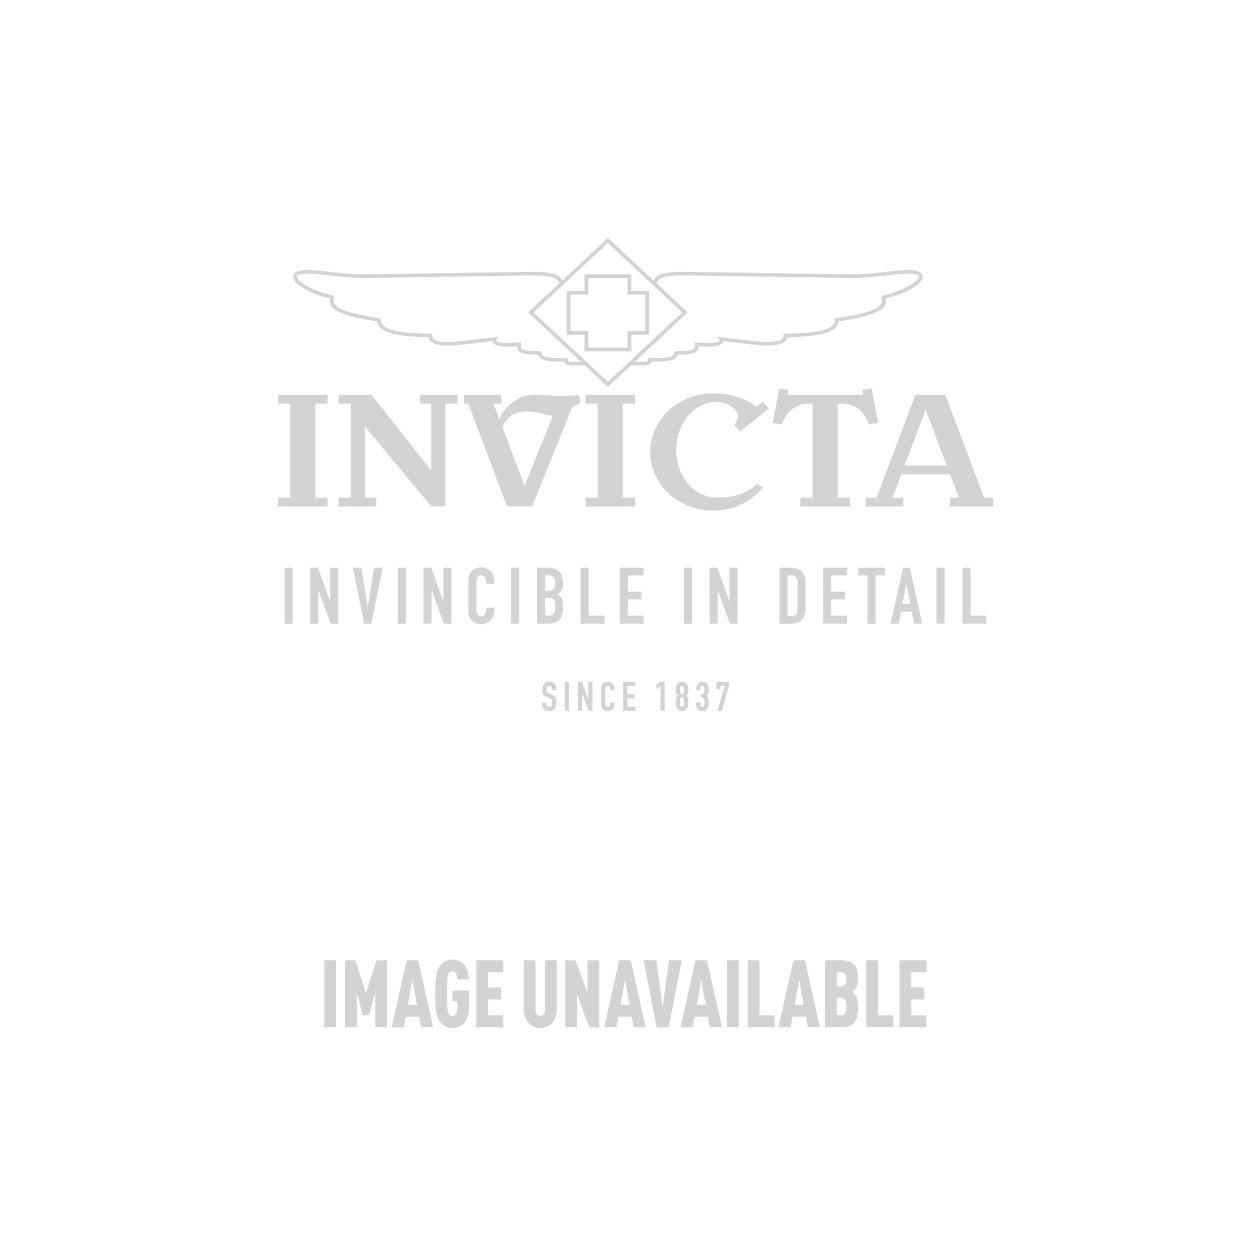 Invicta Corduba Swiss Movement Quartz Watch - Stainless Steel case Stainless Steel band - Model 90203